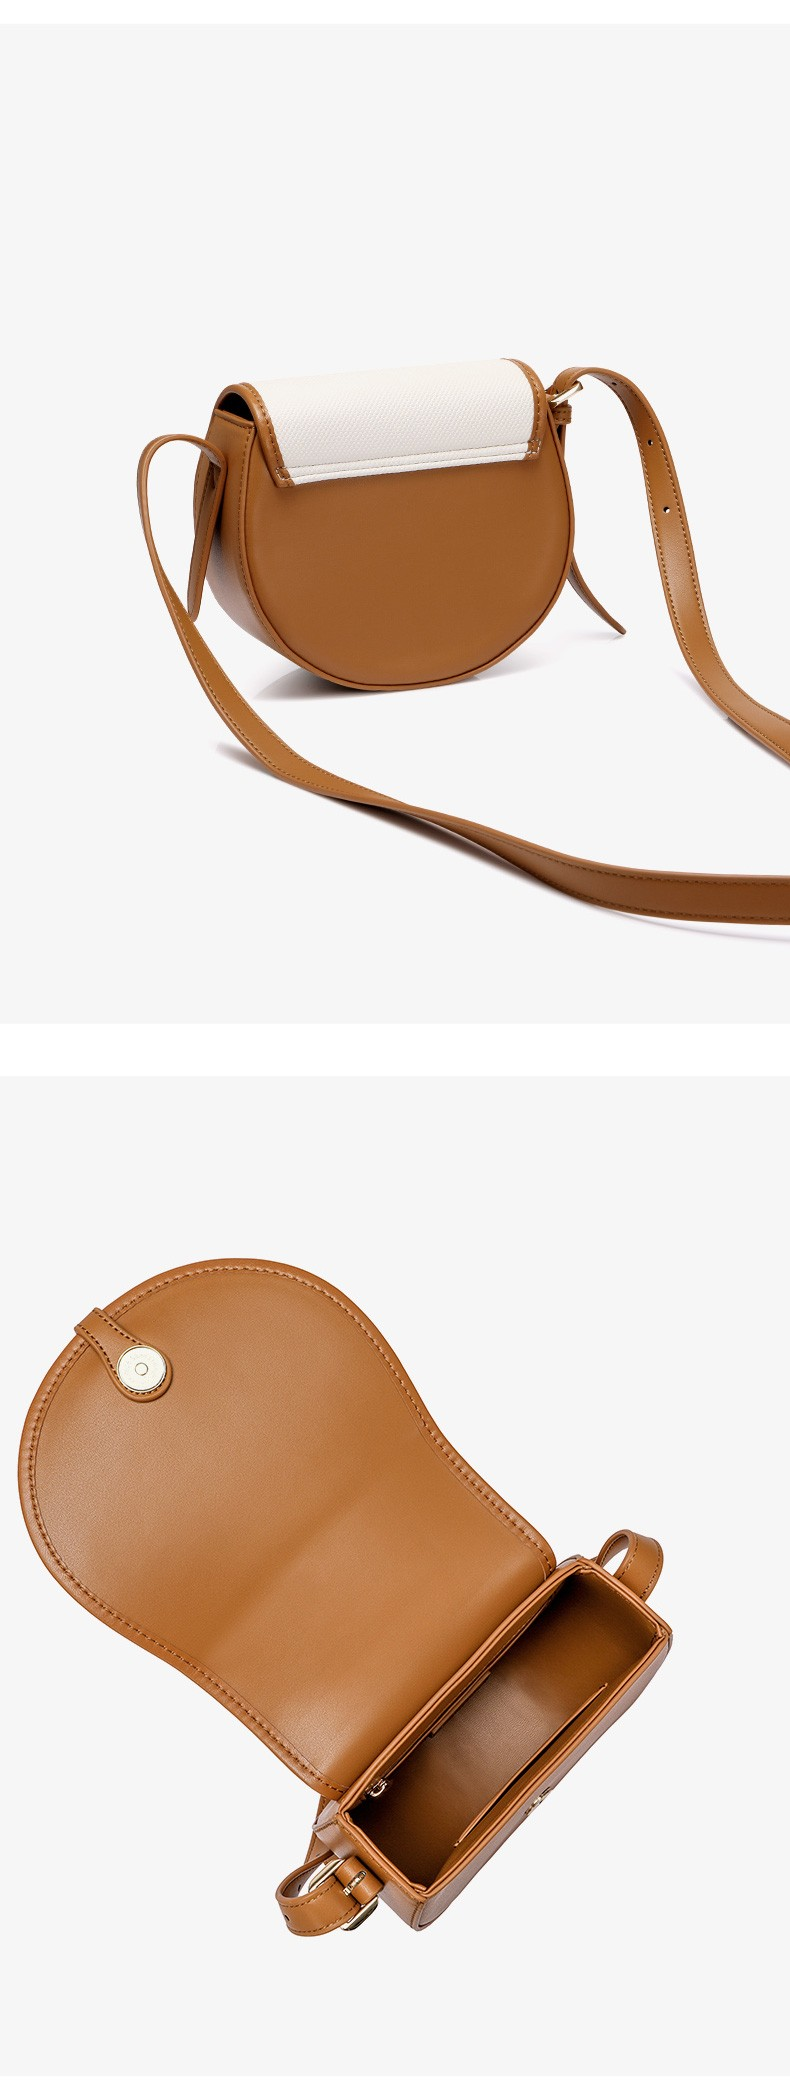 Túi đeo chéo nữ thời trang Nucelle Virgo VG564